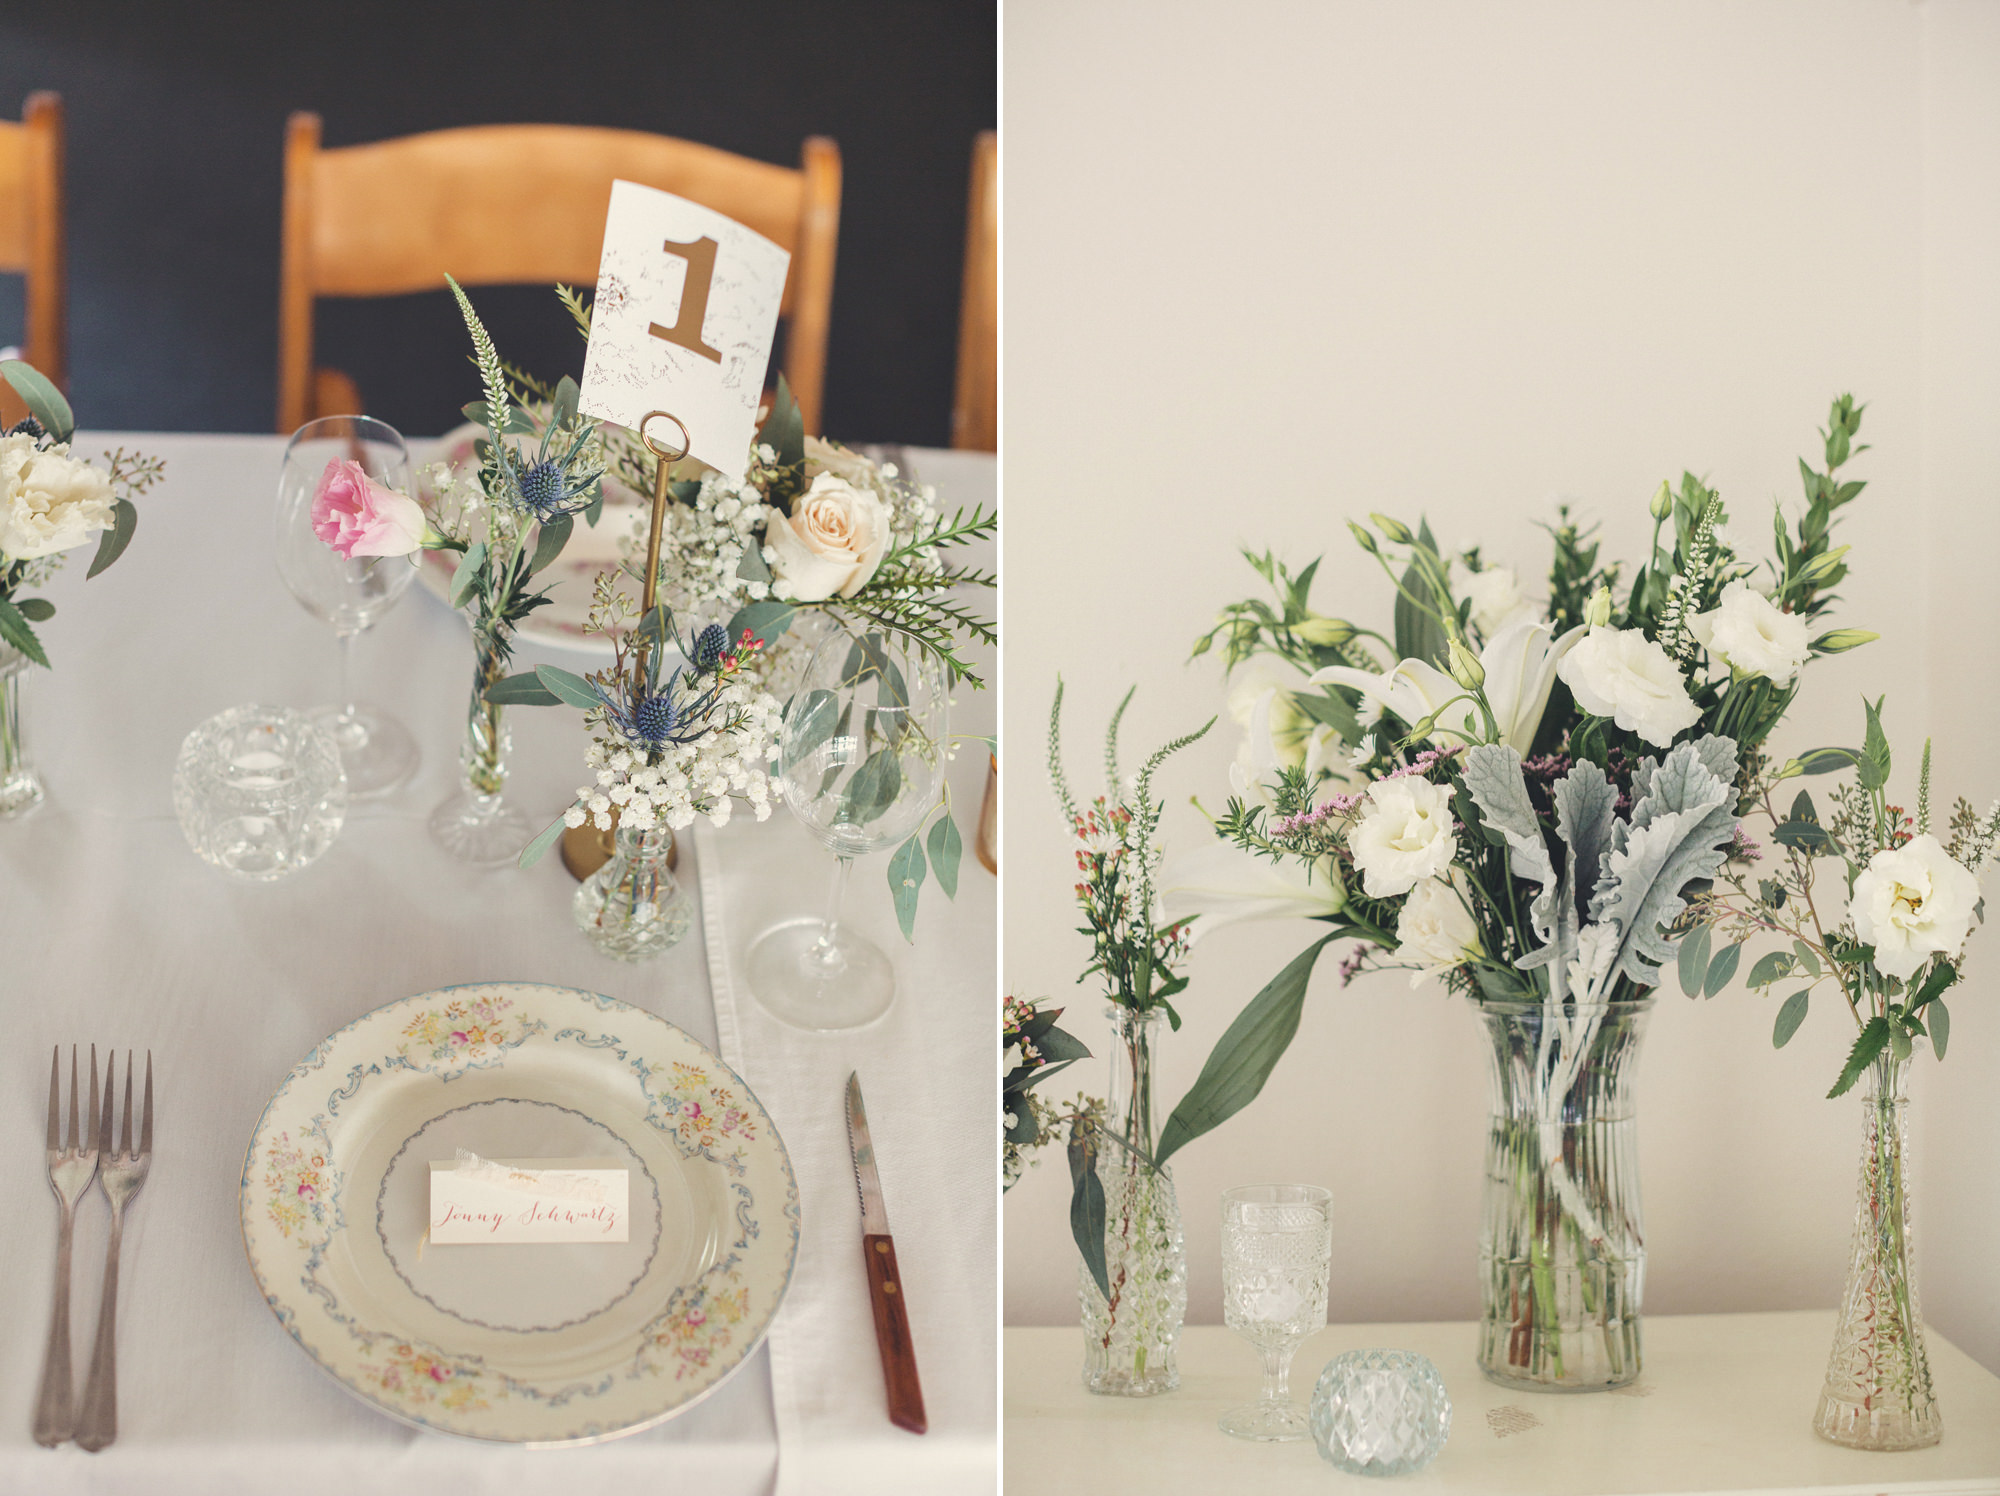 Little River Inn Wedding@Anne-Claire Brun 159